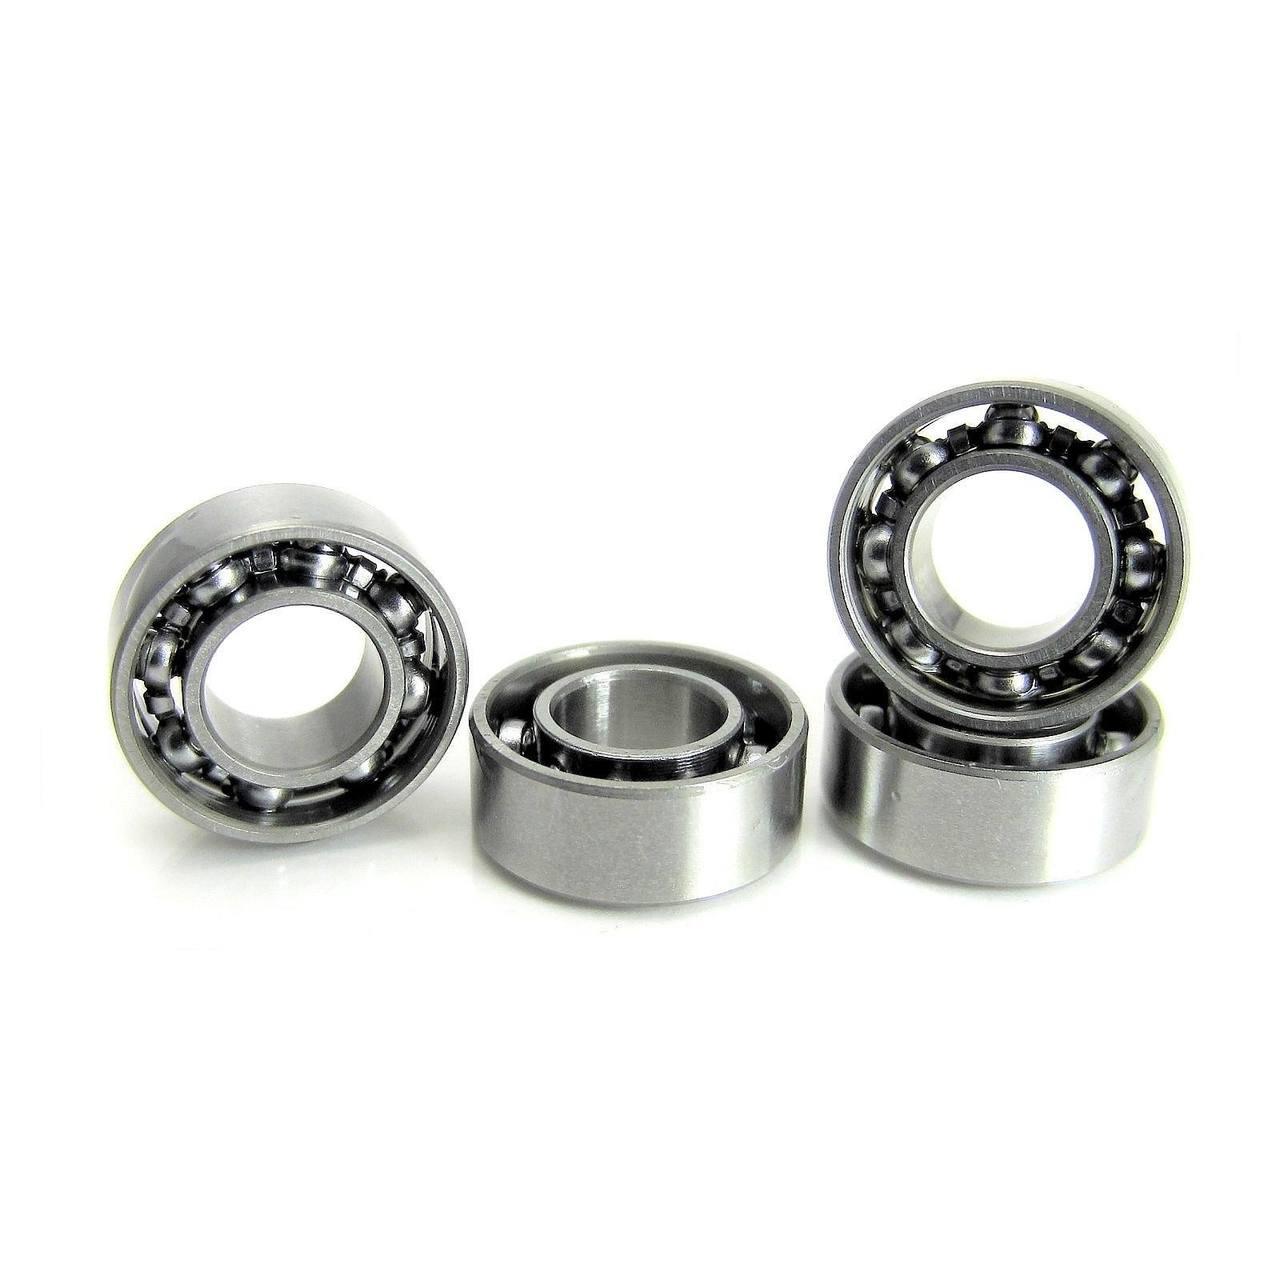 "1/4x1/2x3/16""  Open A5 Precision Ball Bearings (4) by TRB RC"